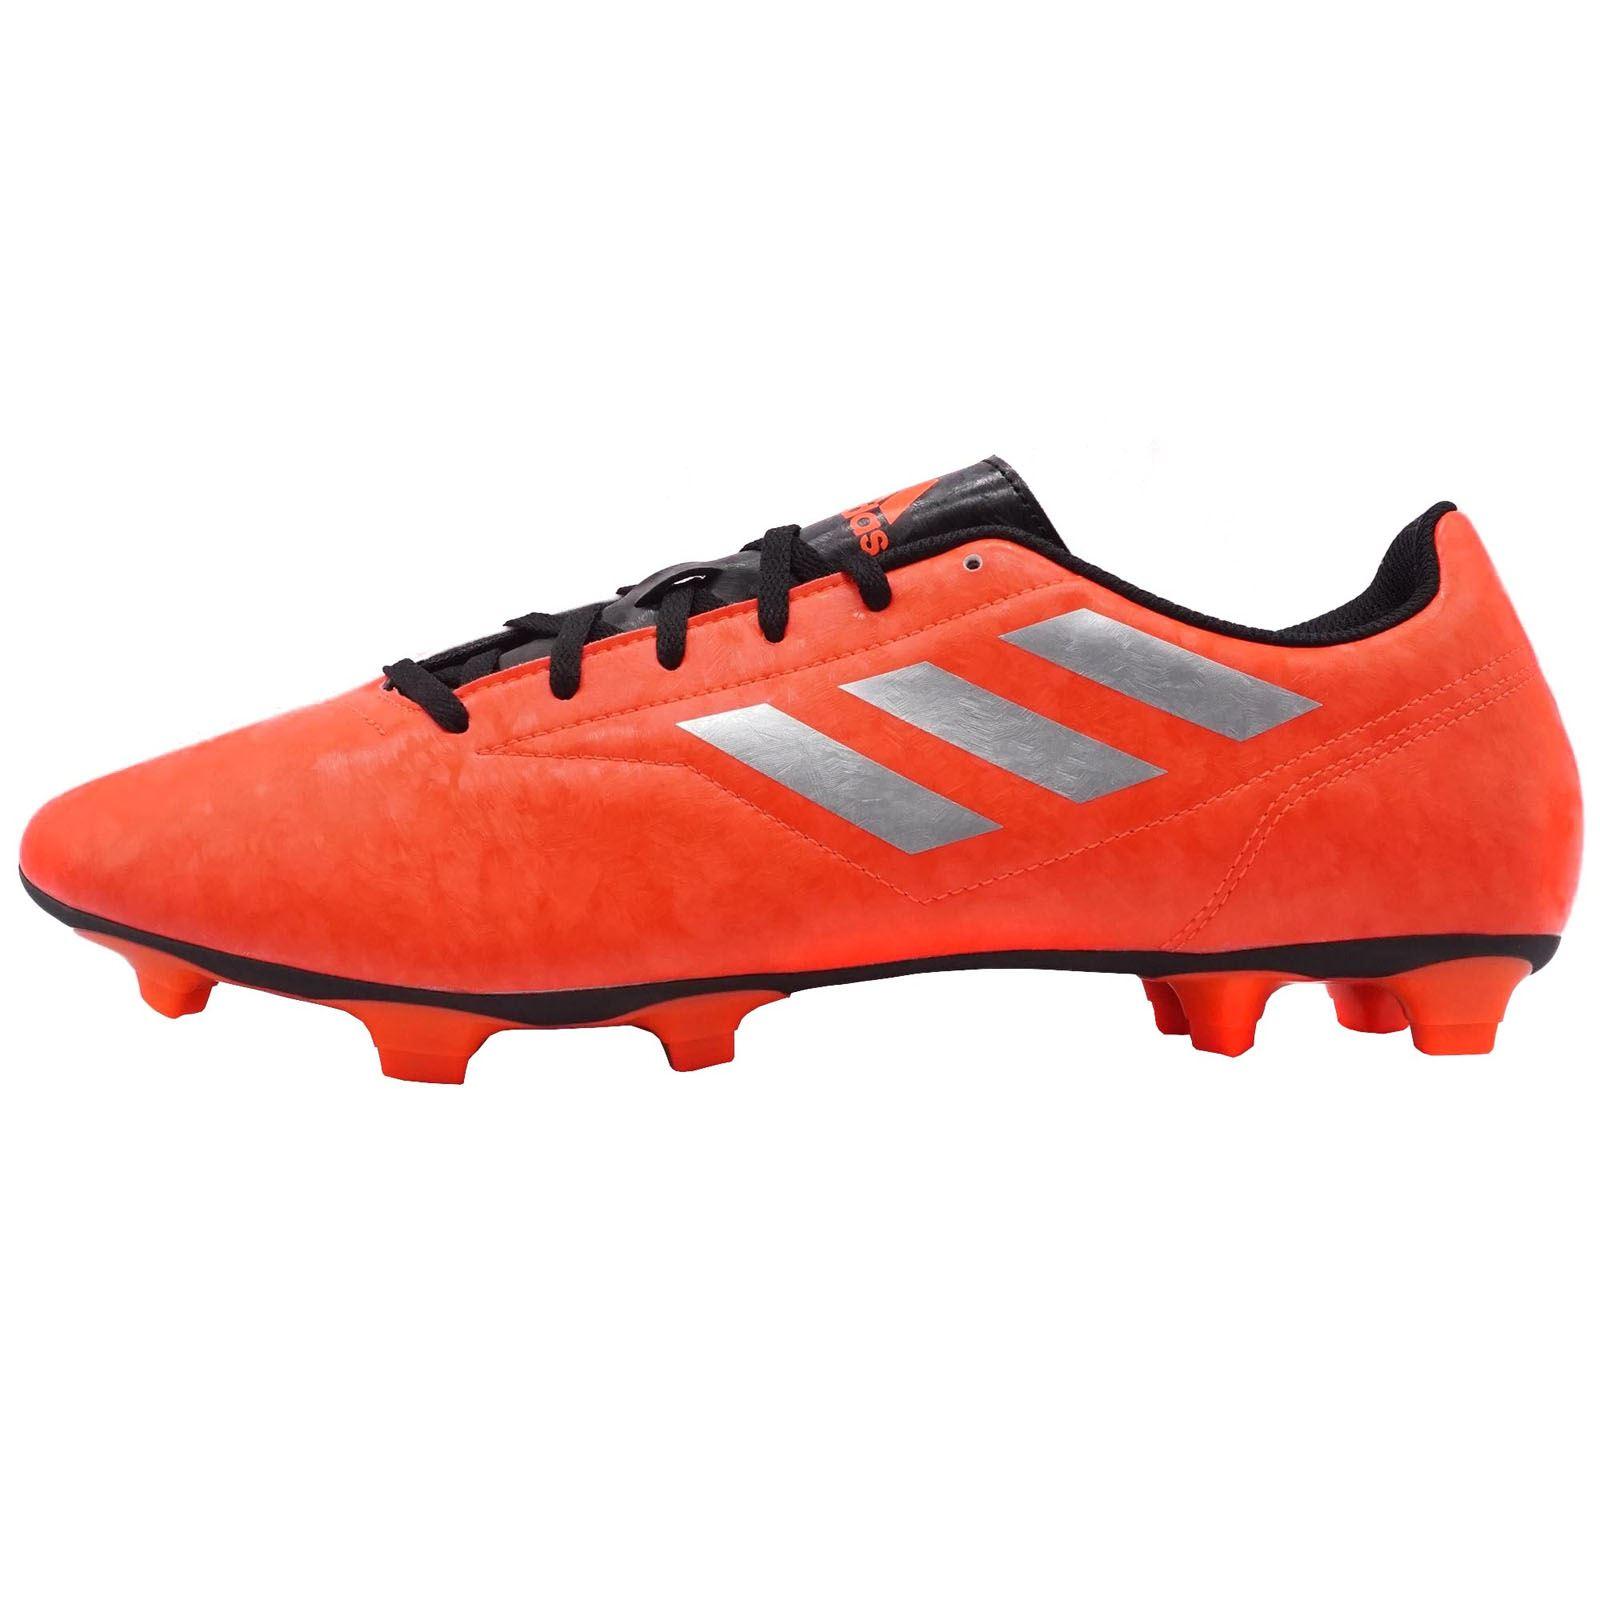 hot sales 3e6d9 0da25 Adidas-nemeziz-17-3-amp-Conquisto-II-Homme-